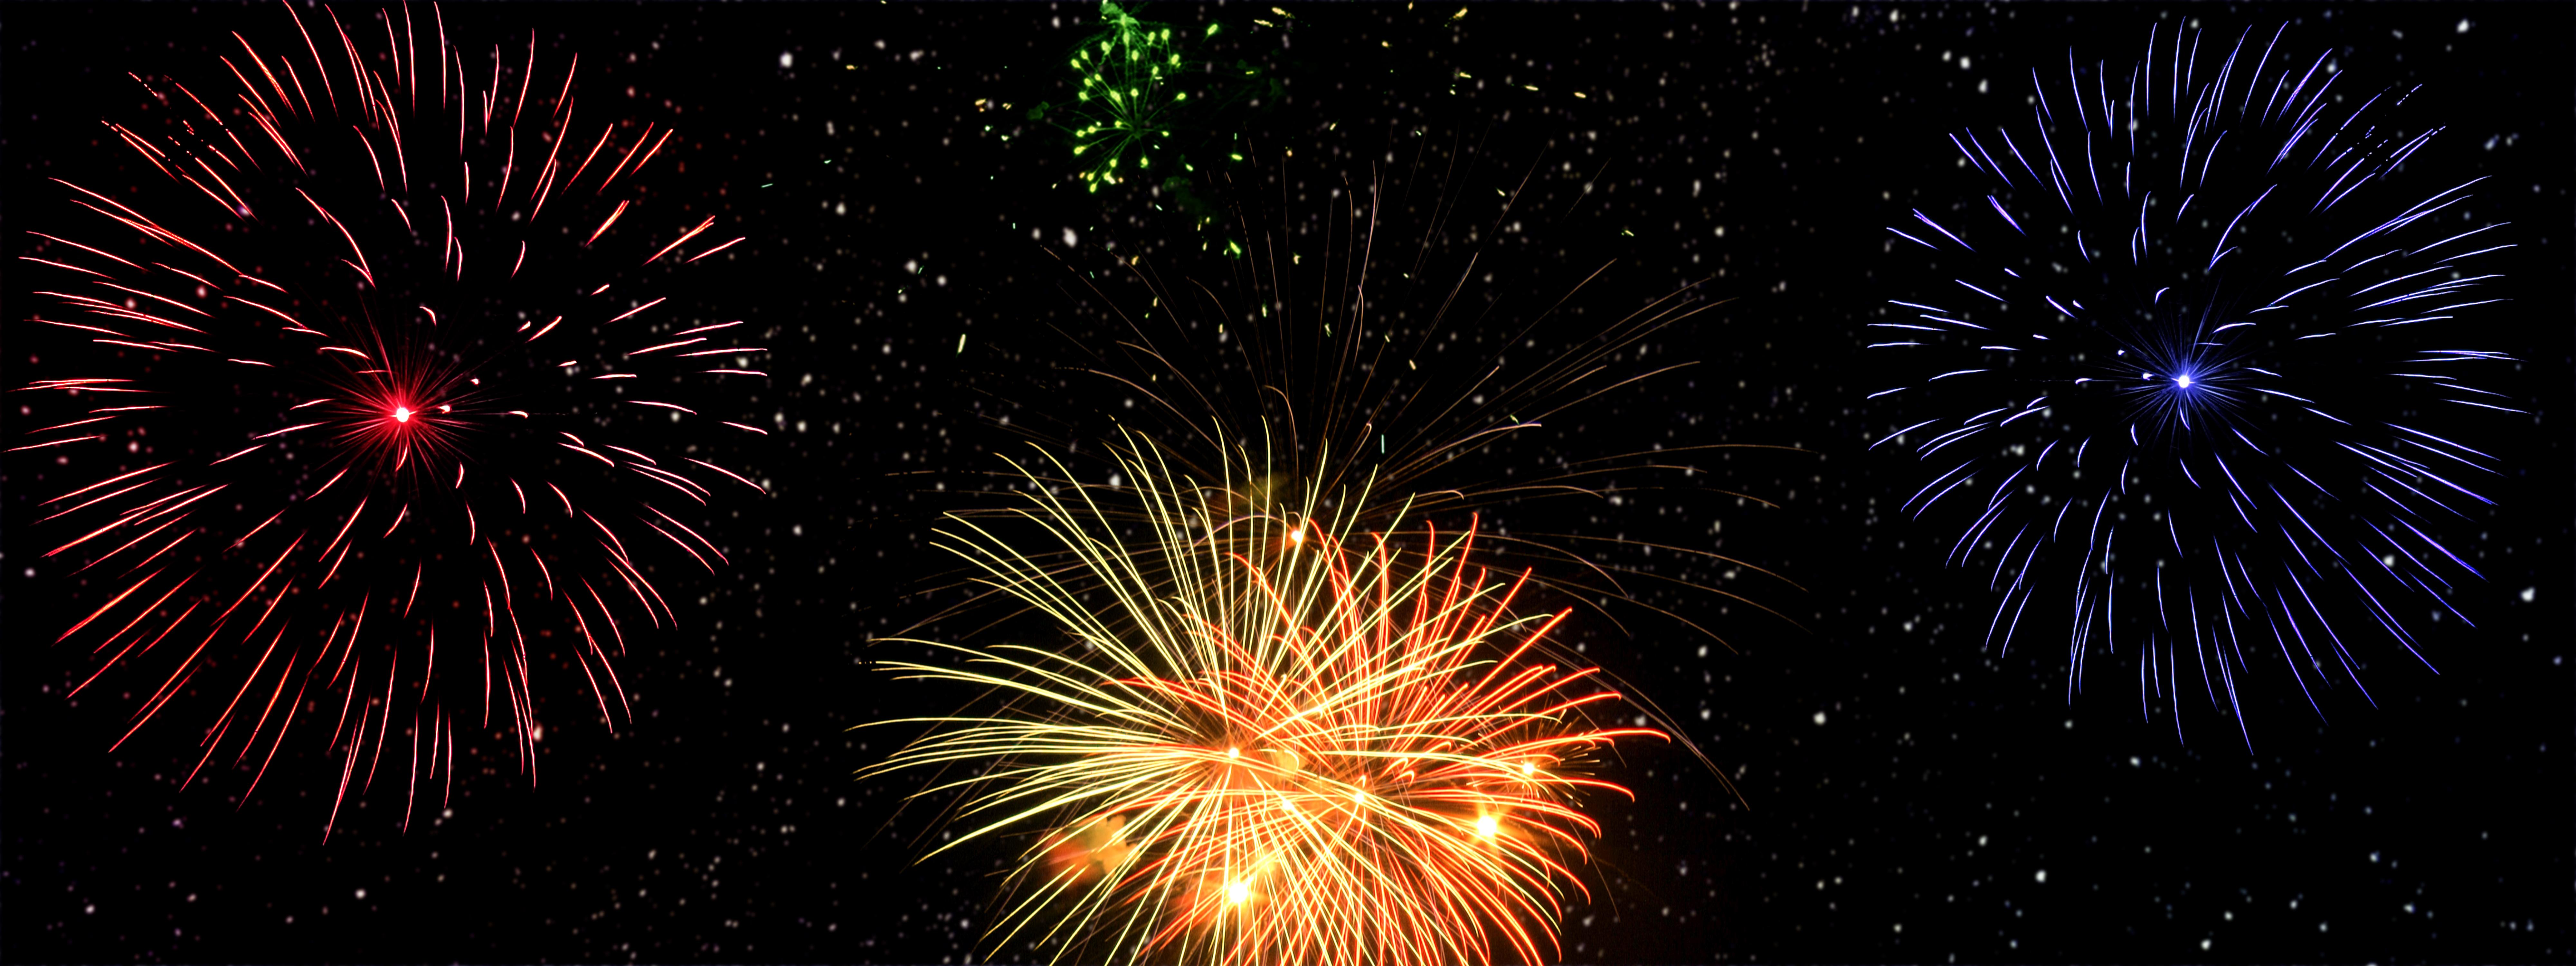 Gambar : tahun Baru, malam tahun baru, kembang api, spanduk